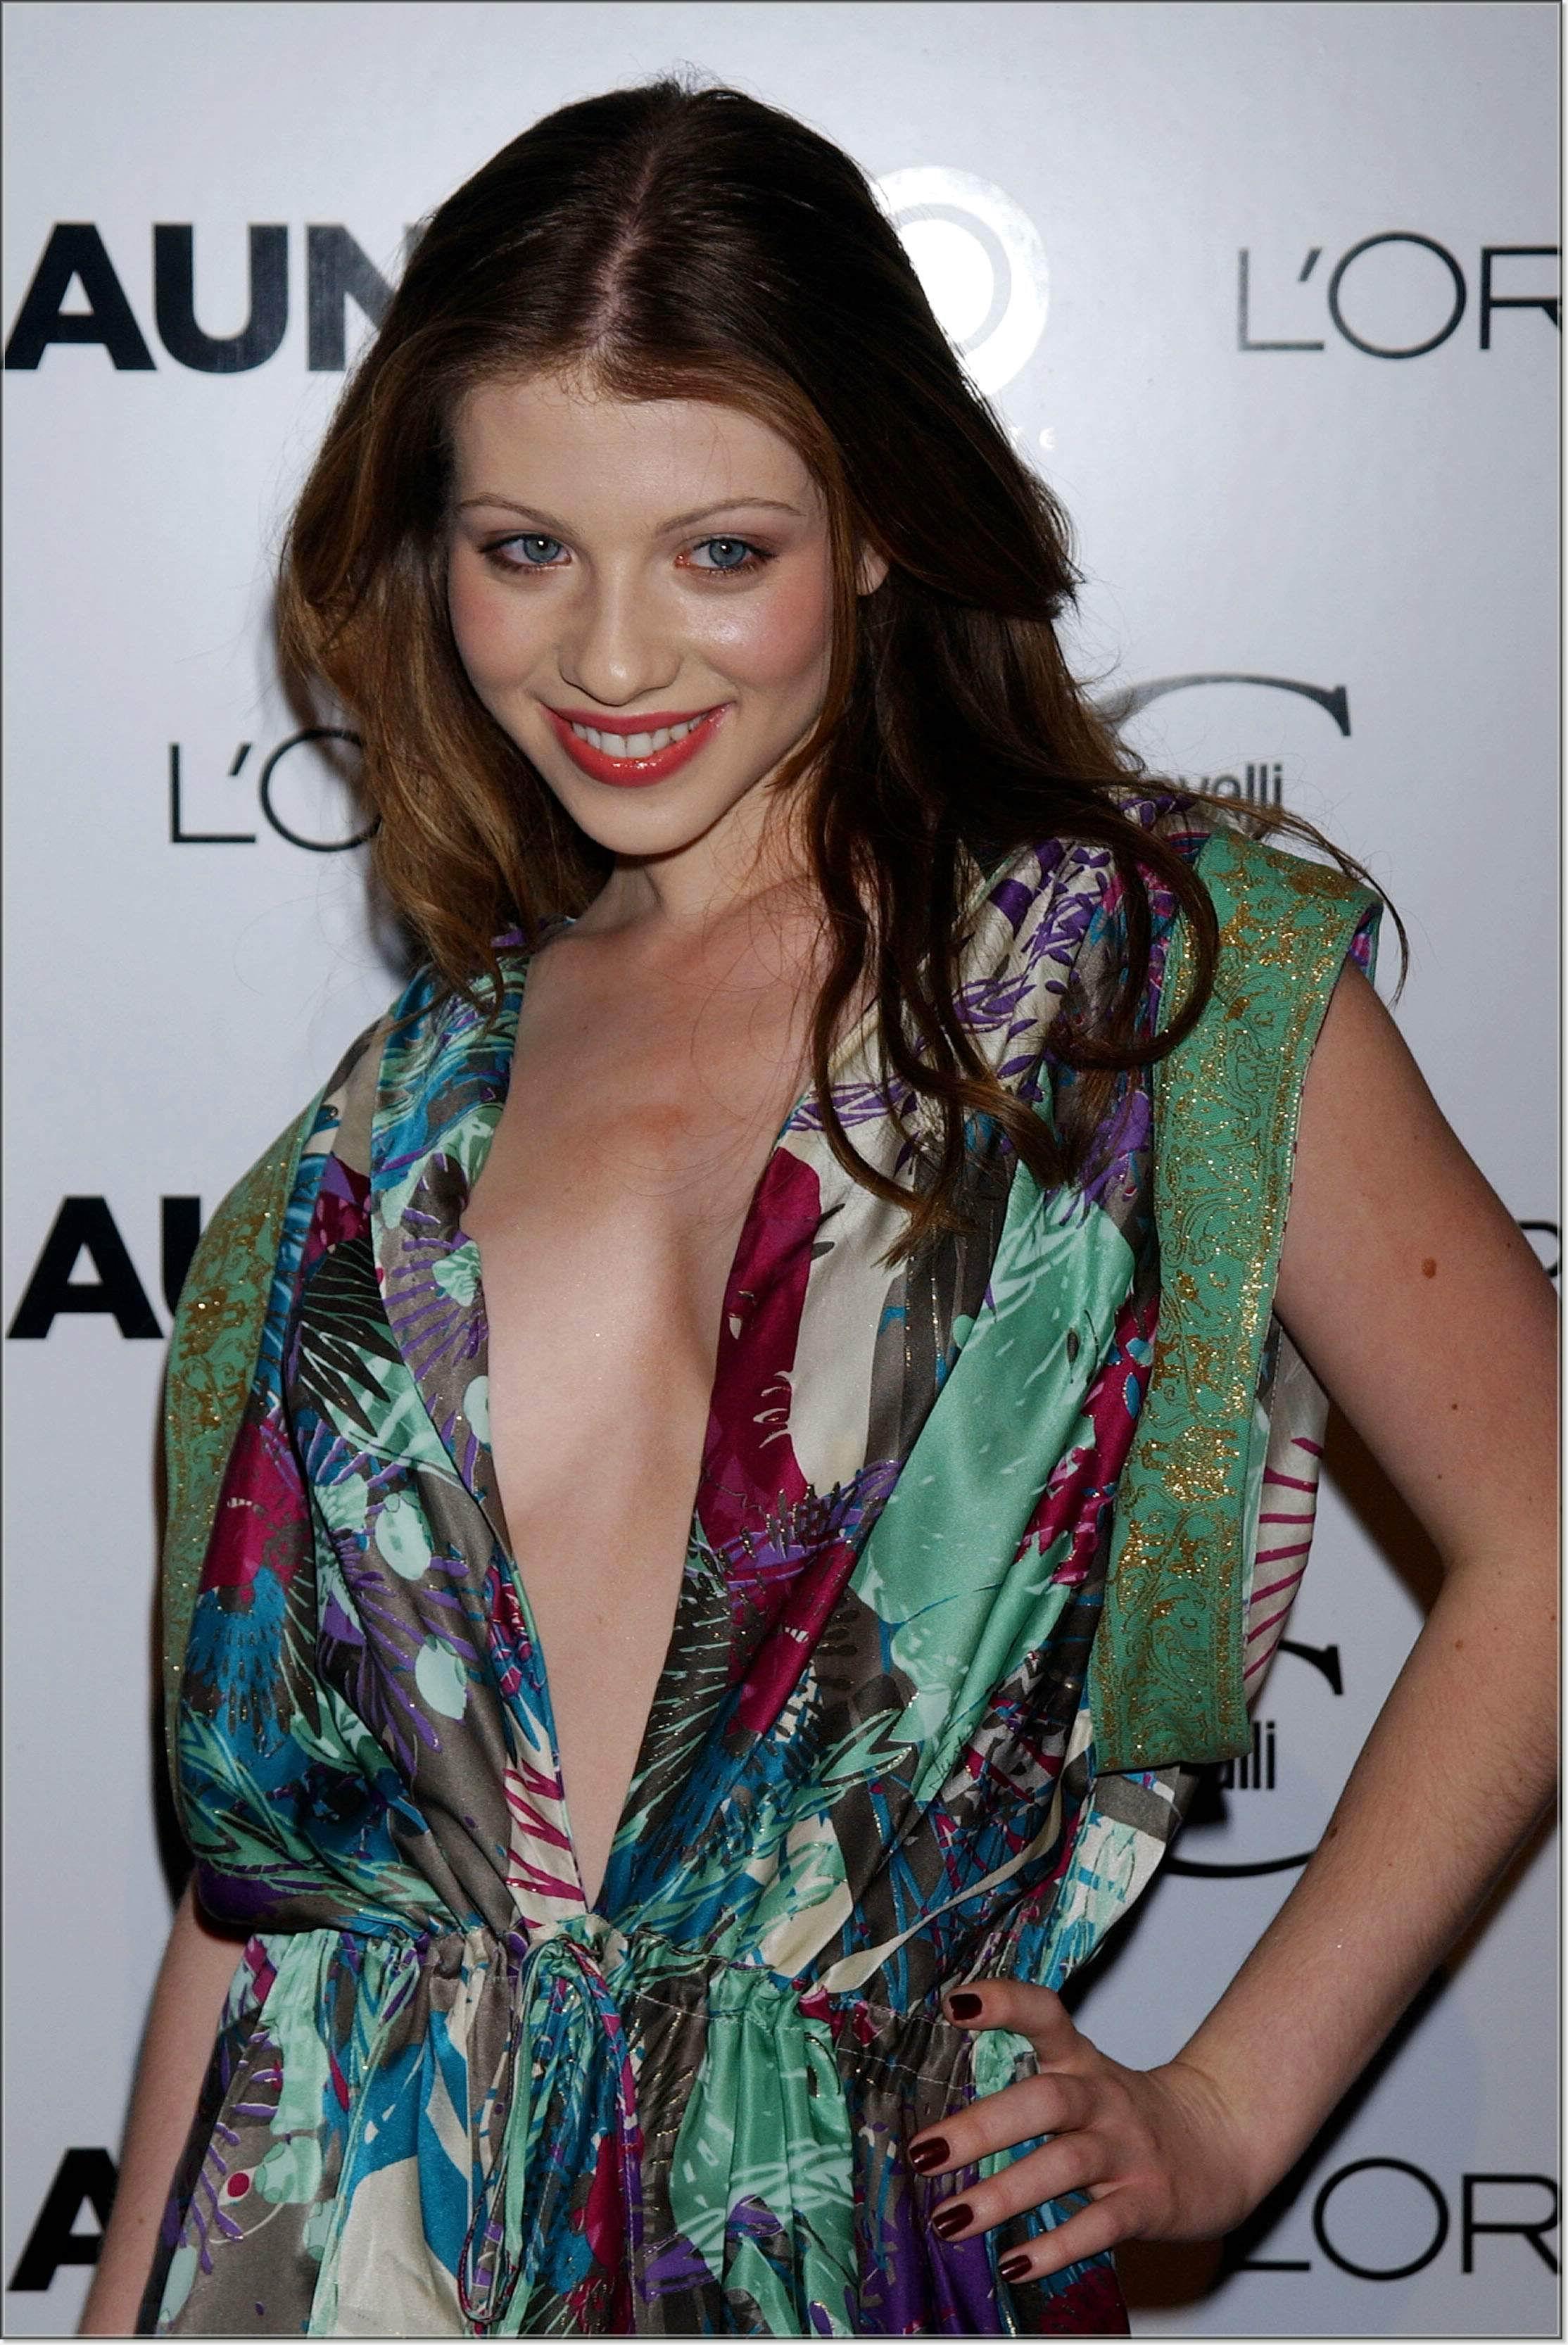 Michelle Trachtenberg desnuda - Fotos y Vdeos